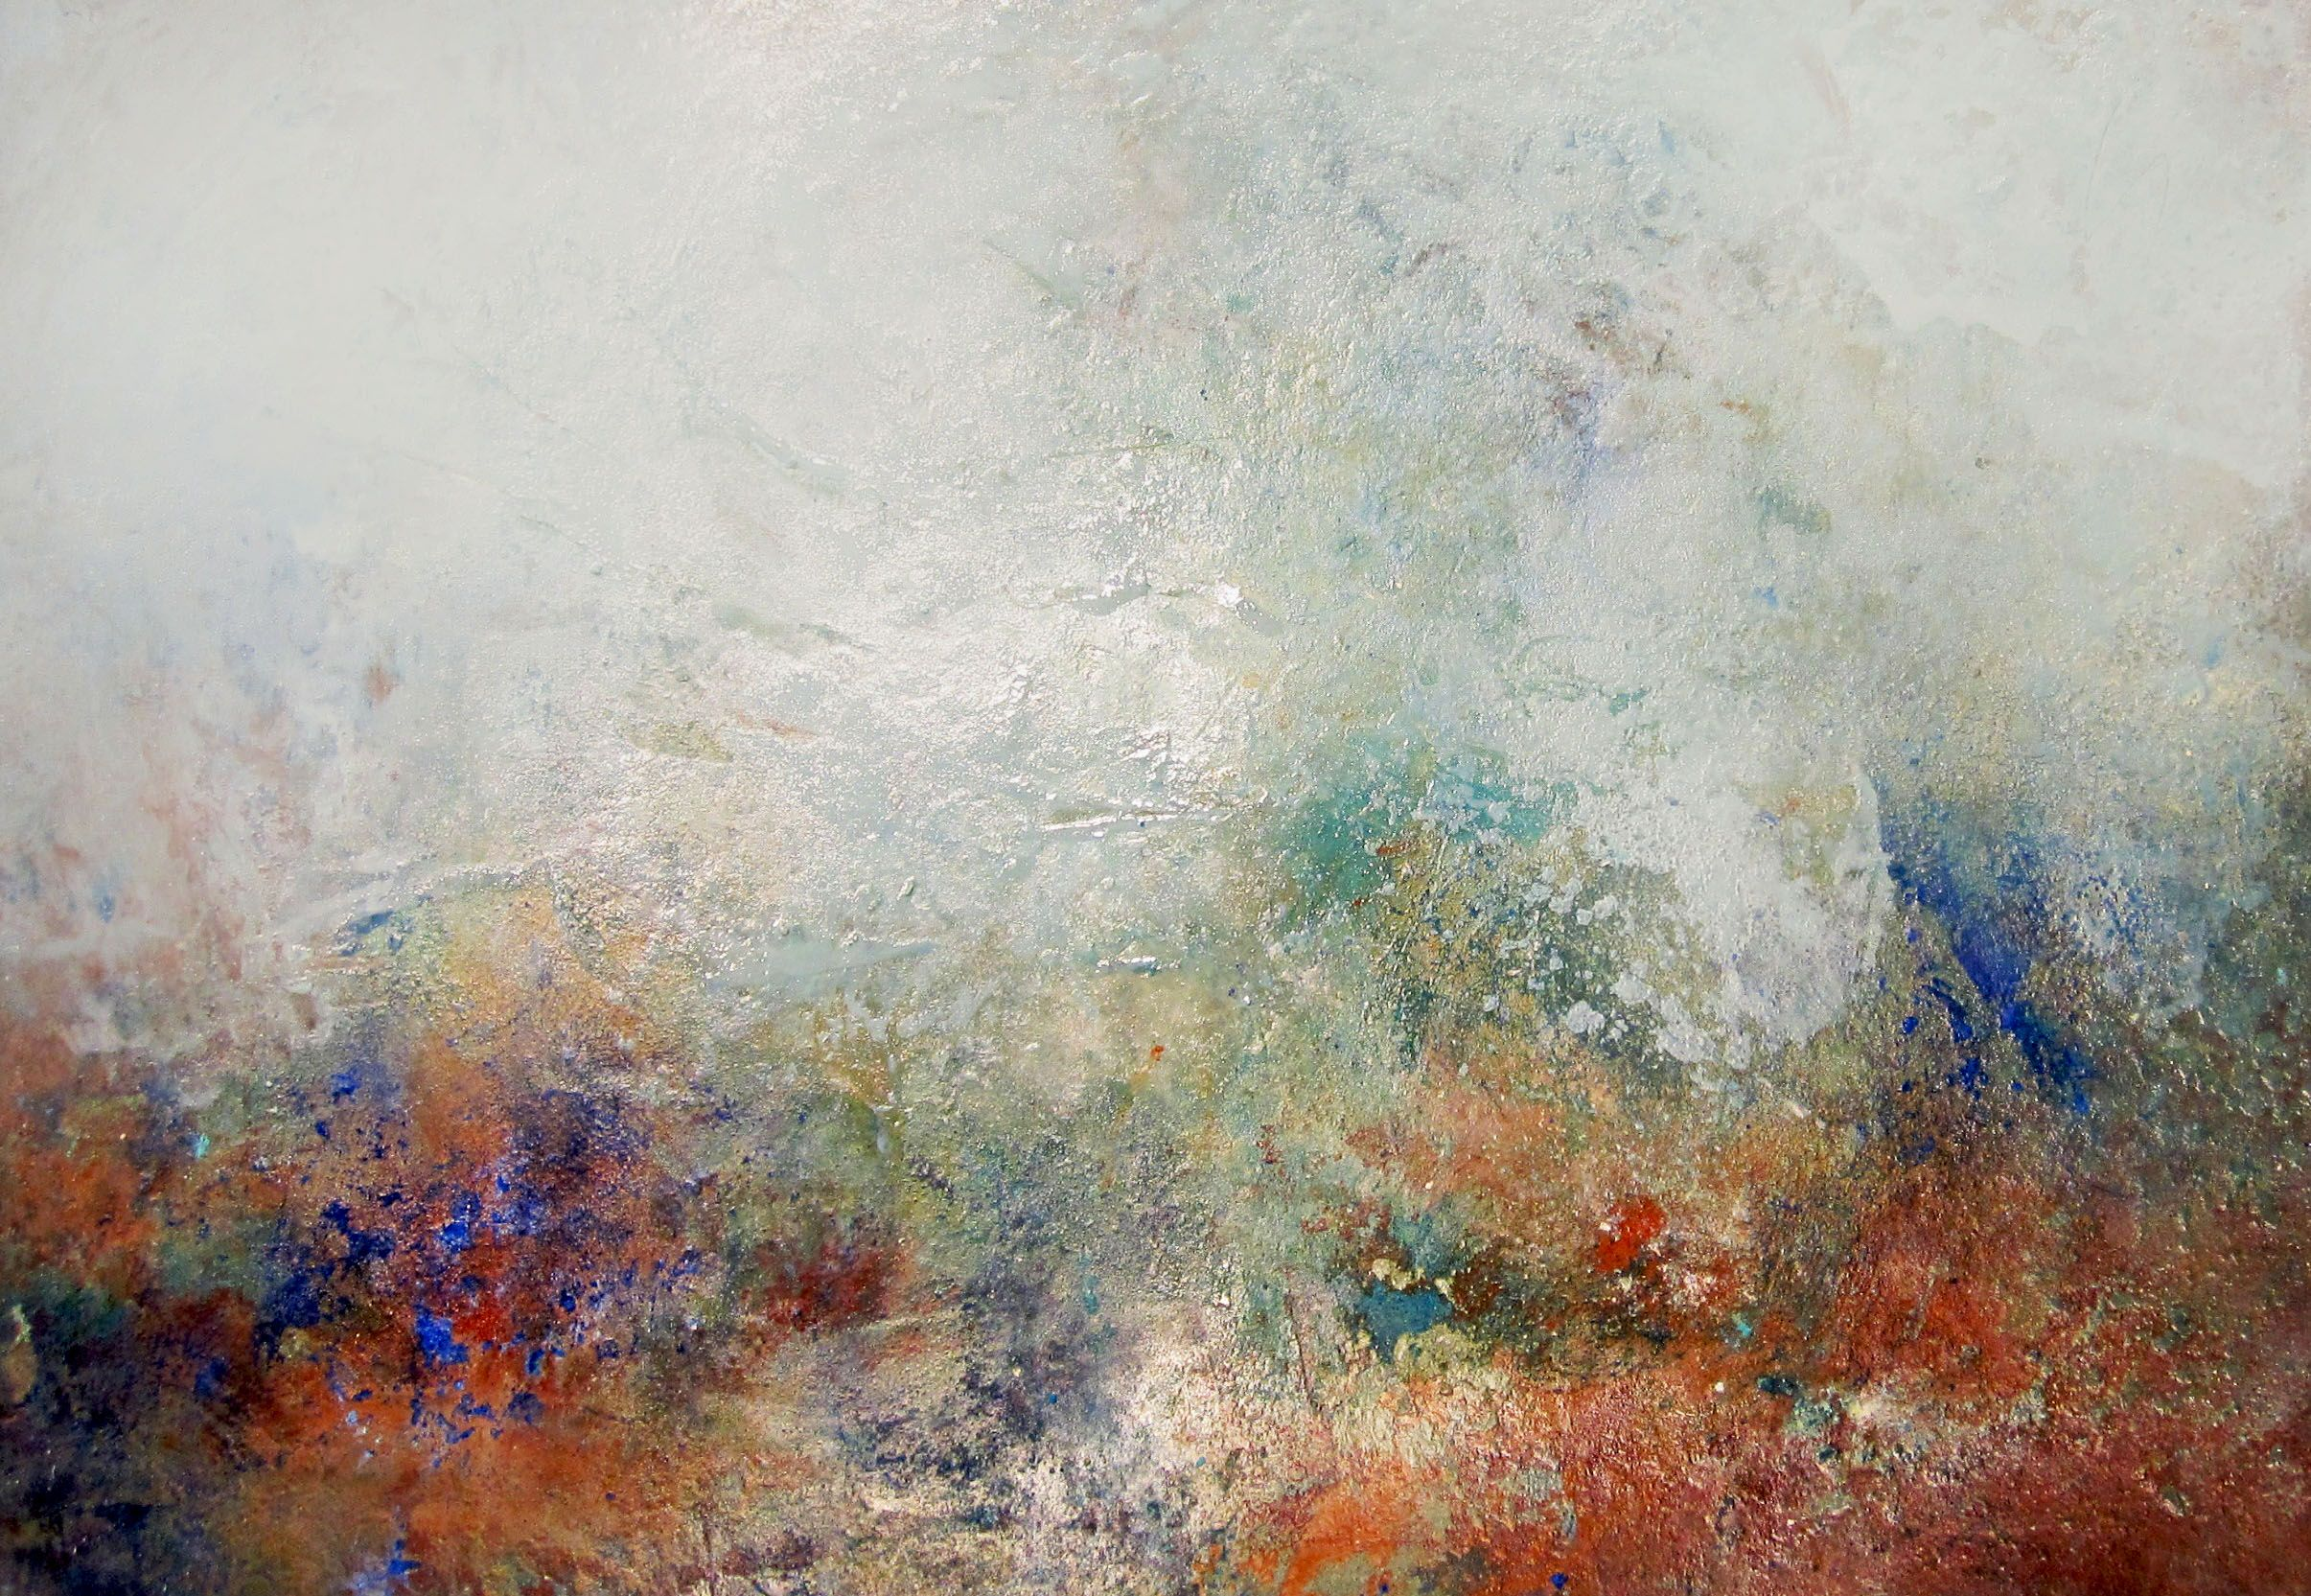 Diana Török « Abstract Artist Gallery Abstract Artist Gallery